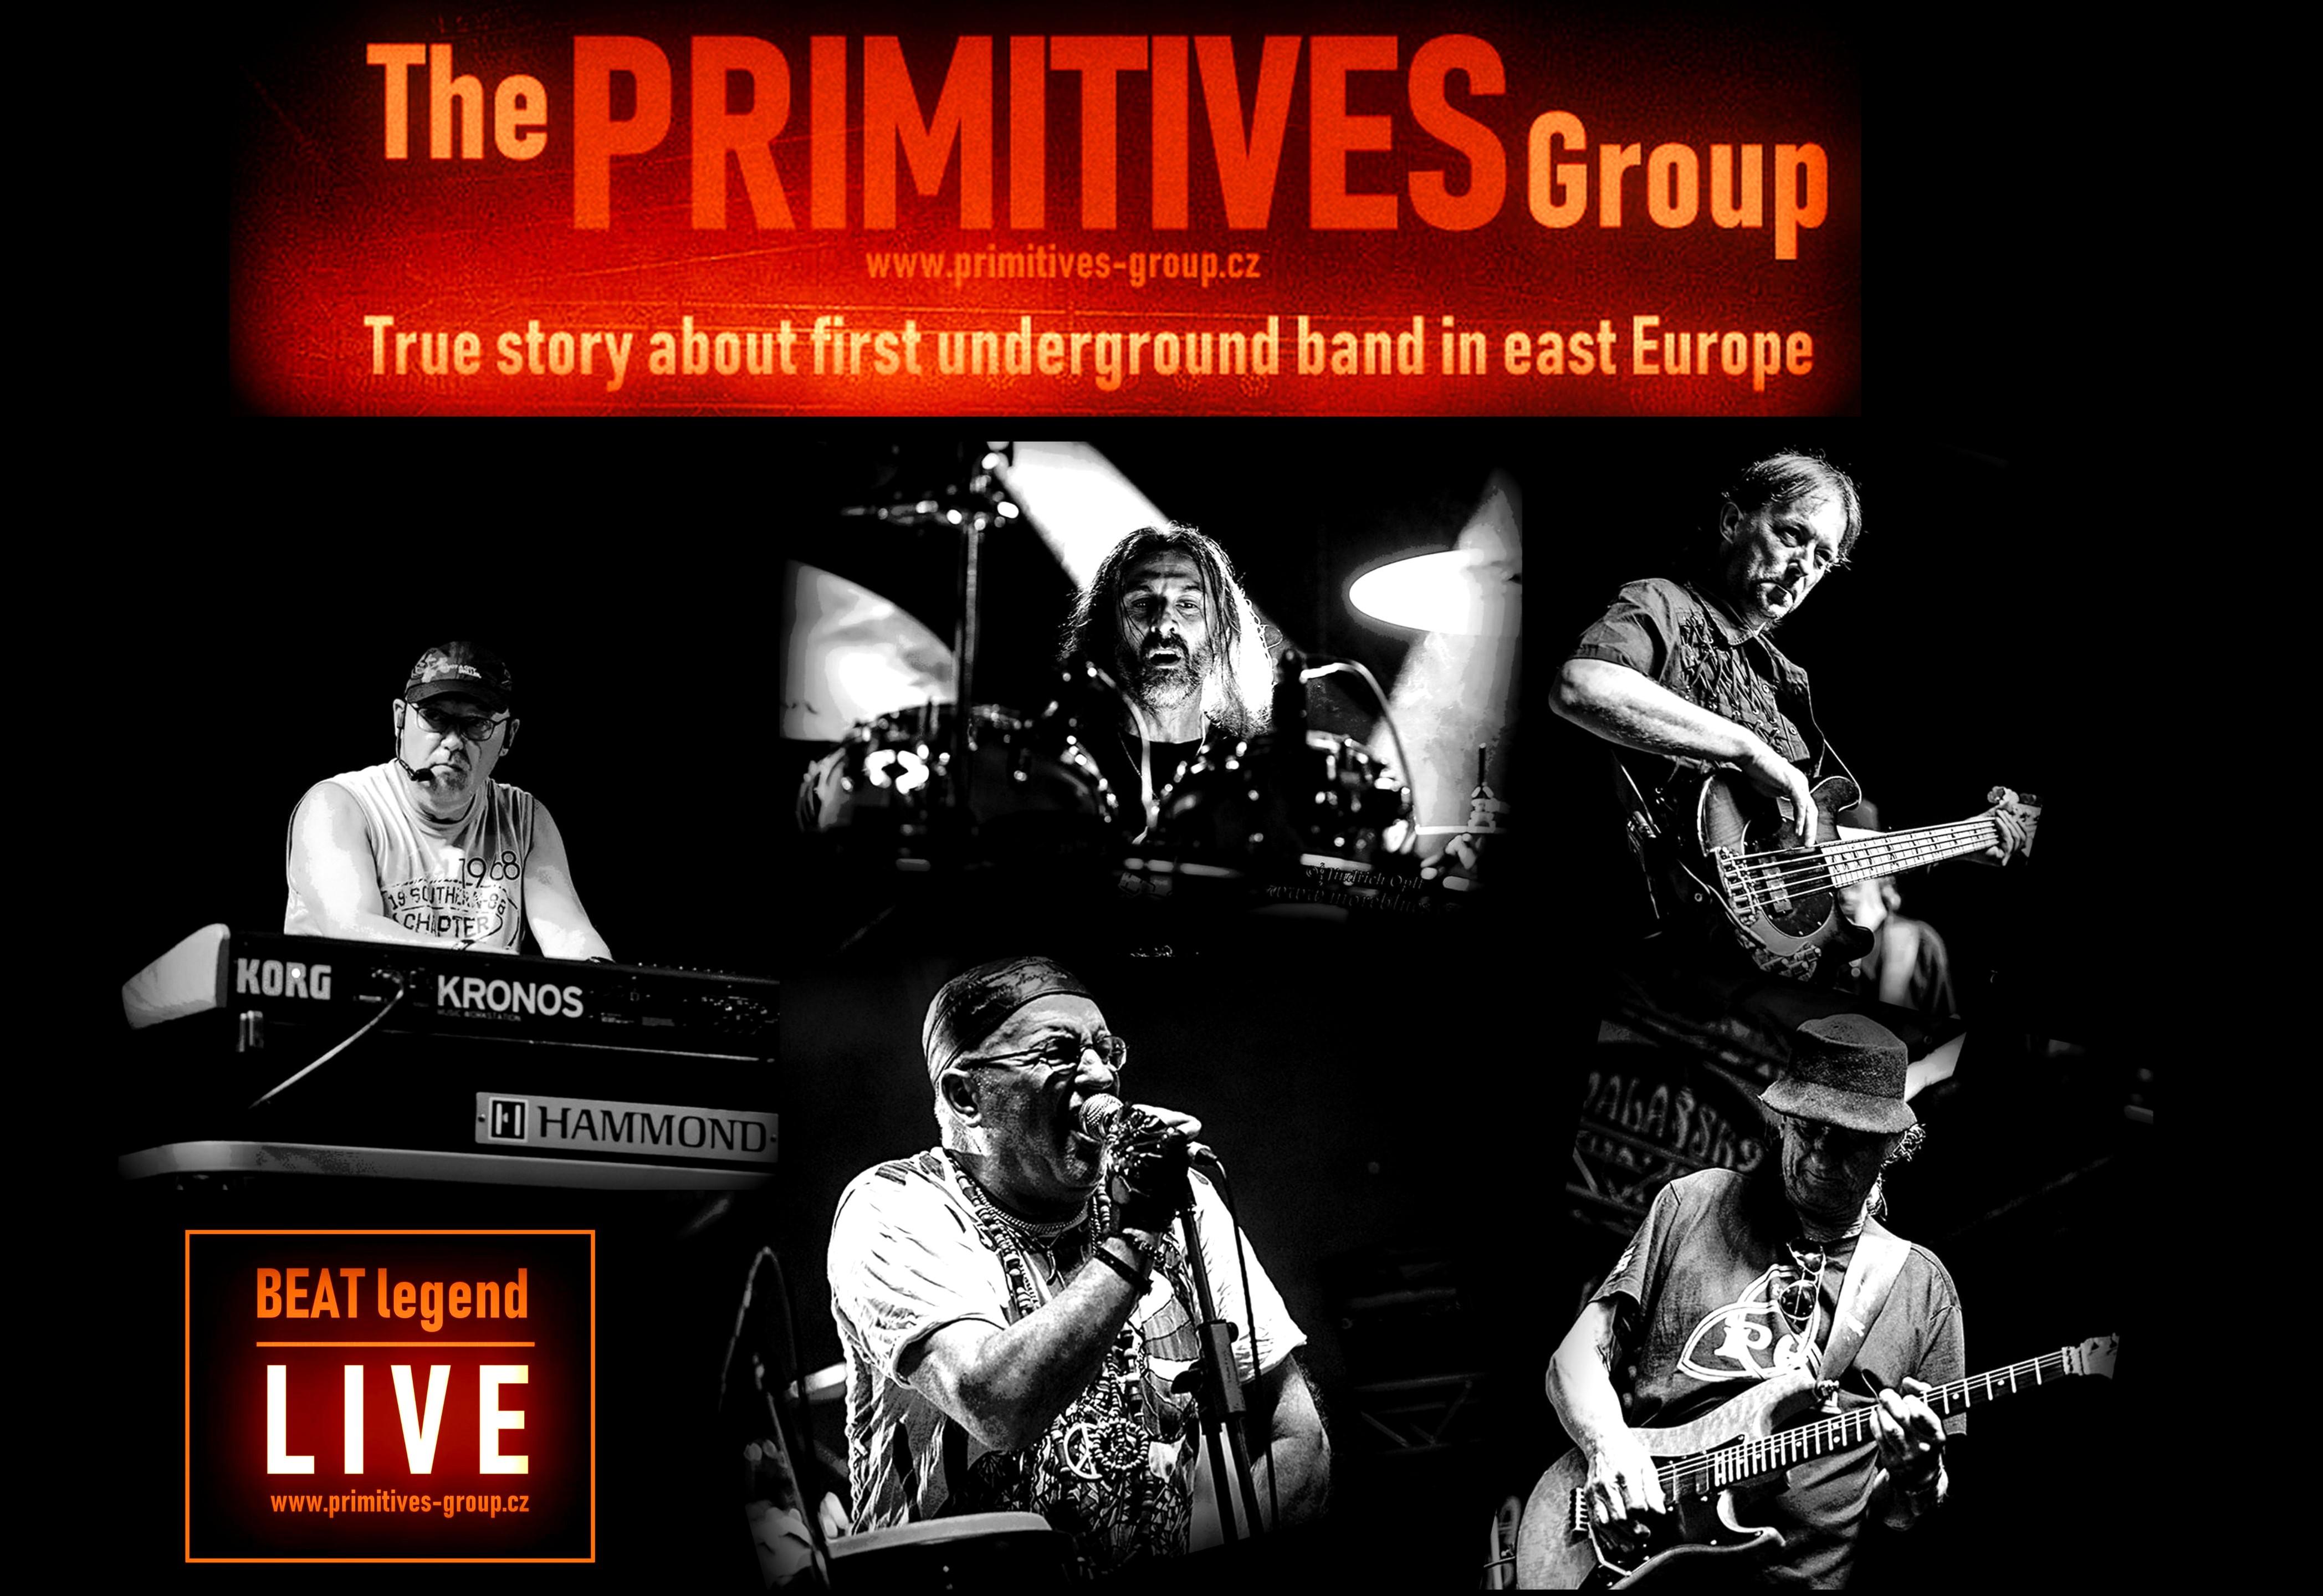 The PRIMITIVES Group -  60' BEAT Legend is BACK